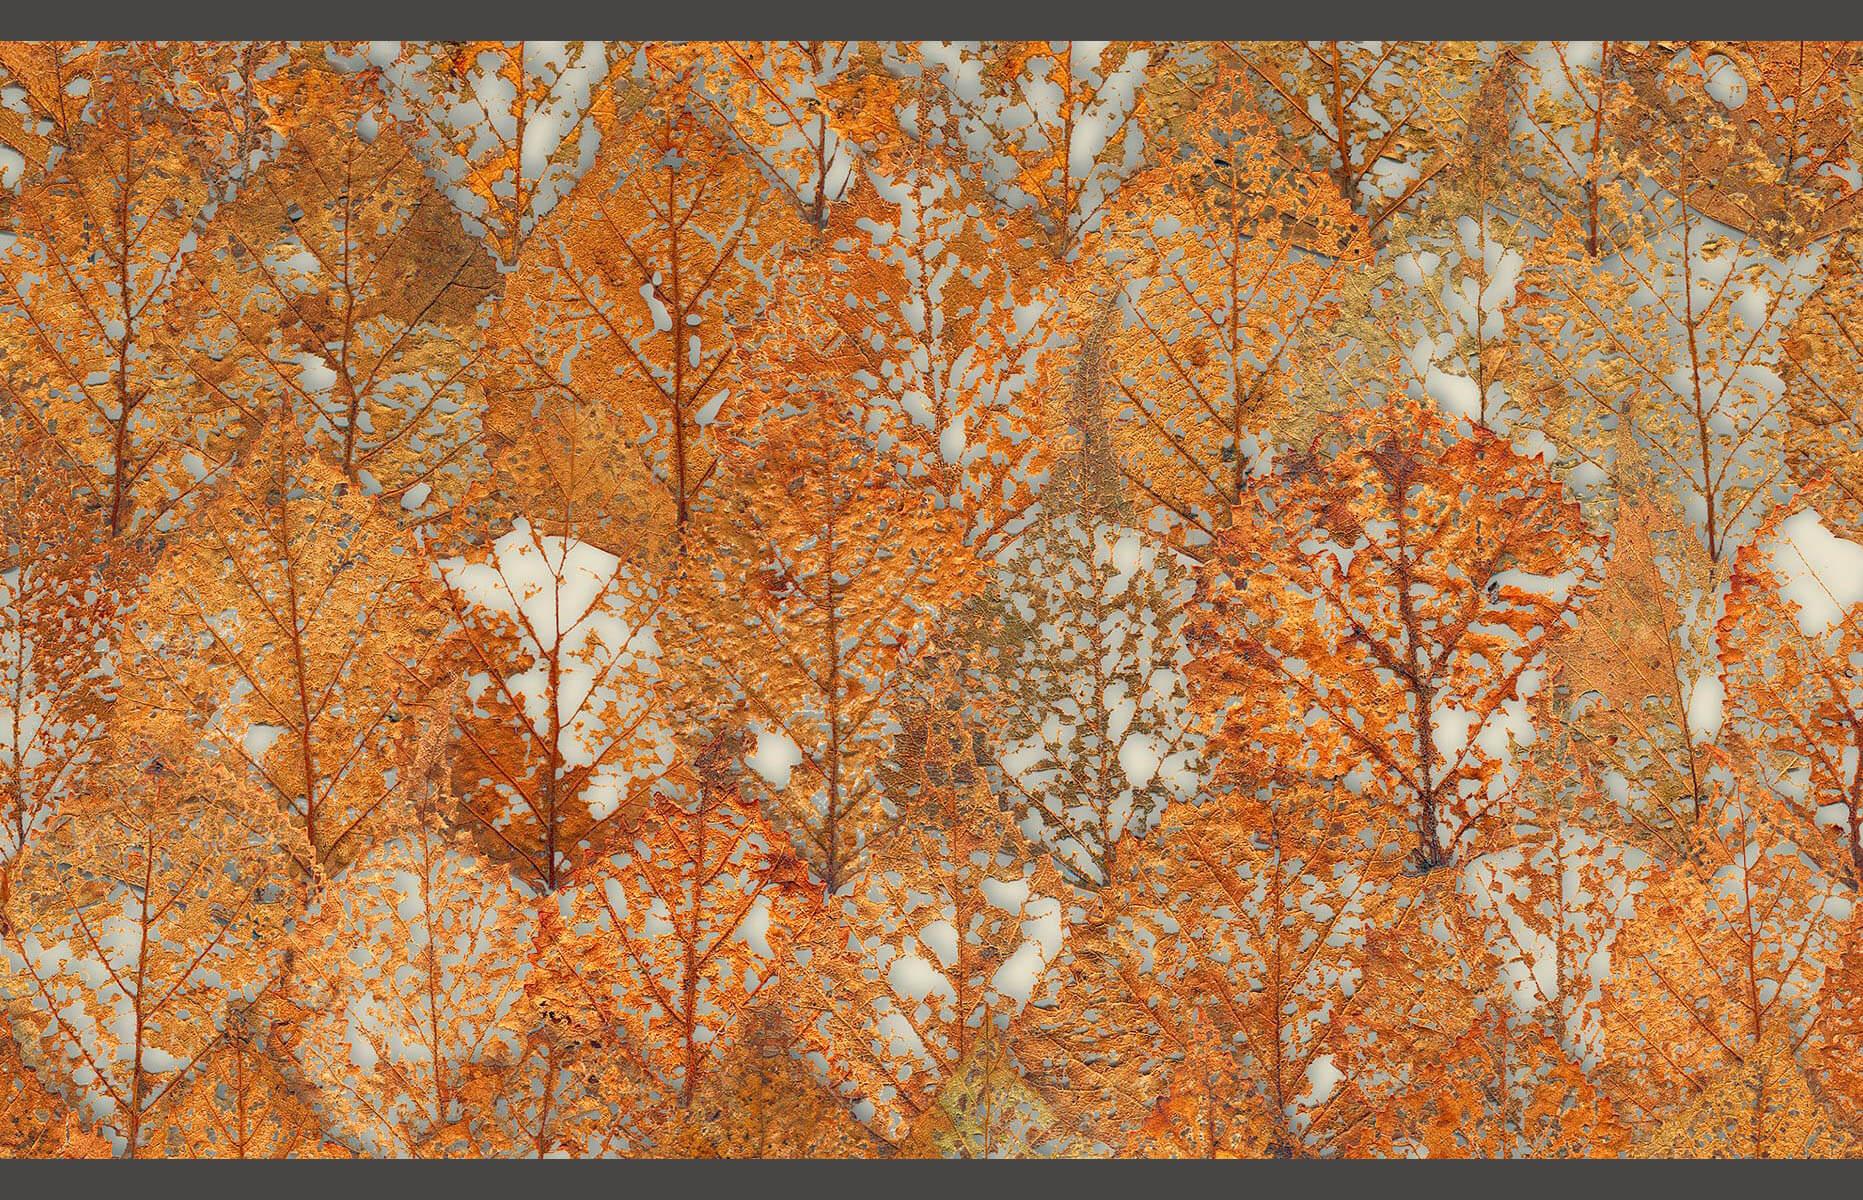 Fall Leaves Layered Detail Doug Garrabrants